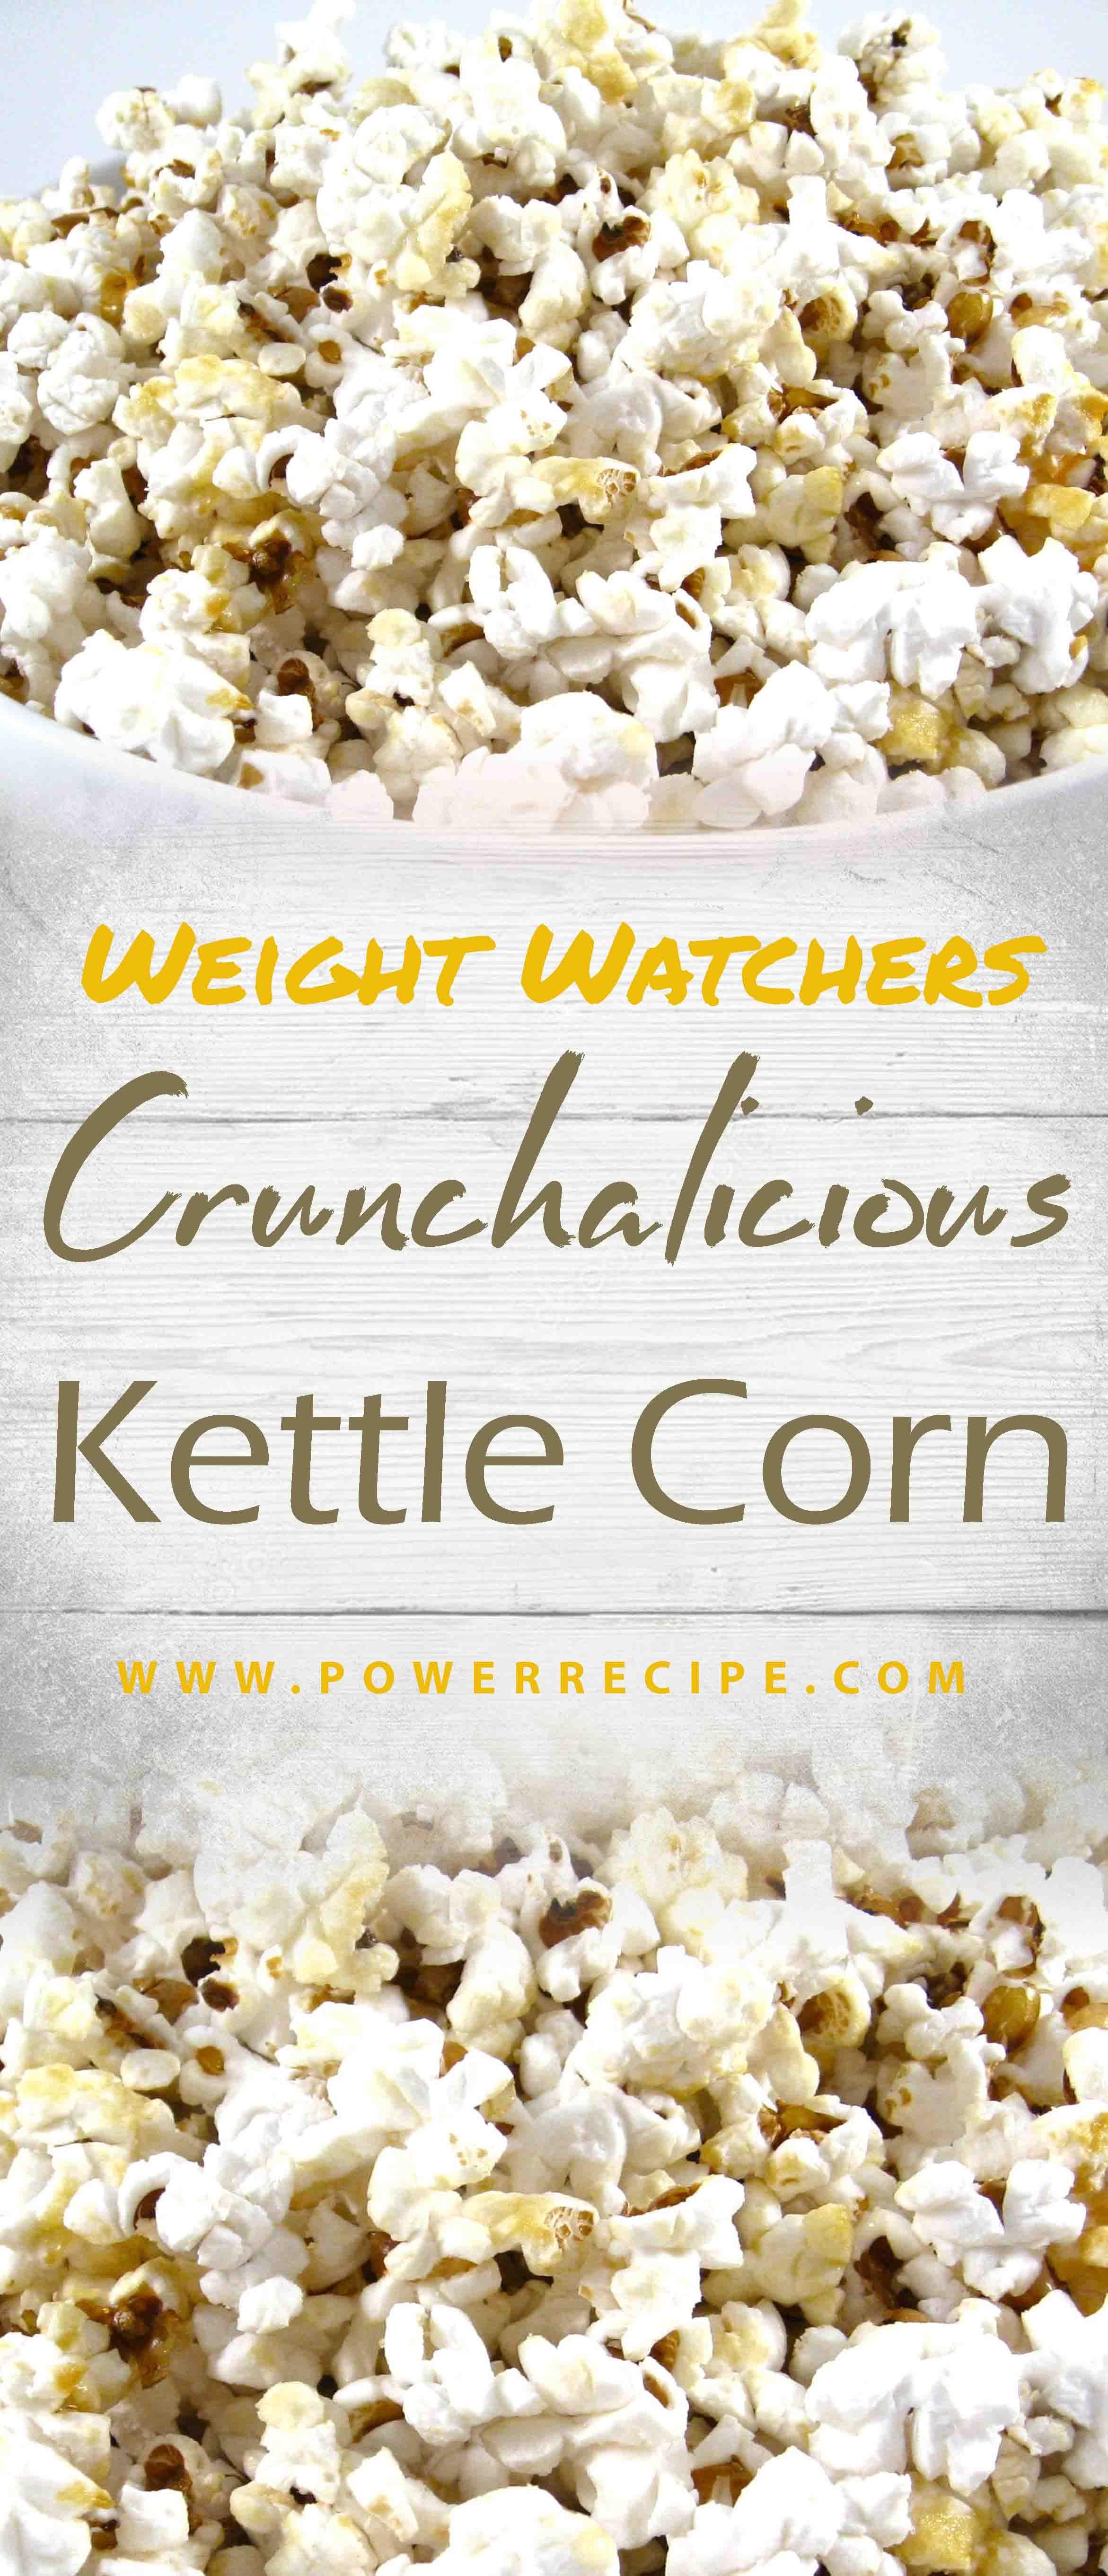 Crunchalicious Kettle Corn You Can Make At Home Healthy Recipe 2020 In 2020 Kettle Corn Kettle Corn Recipe Popcorn Recipes Healthy